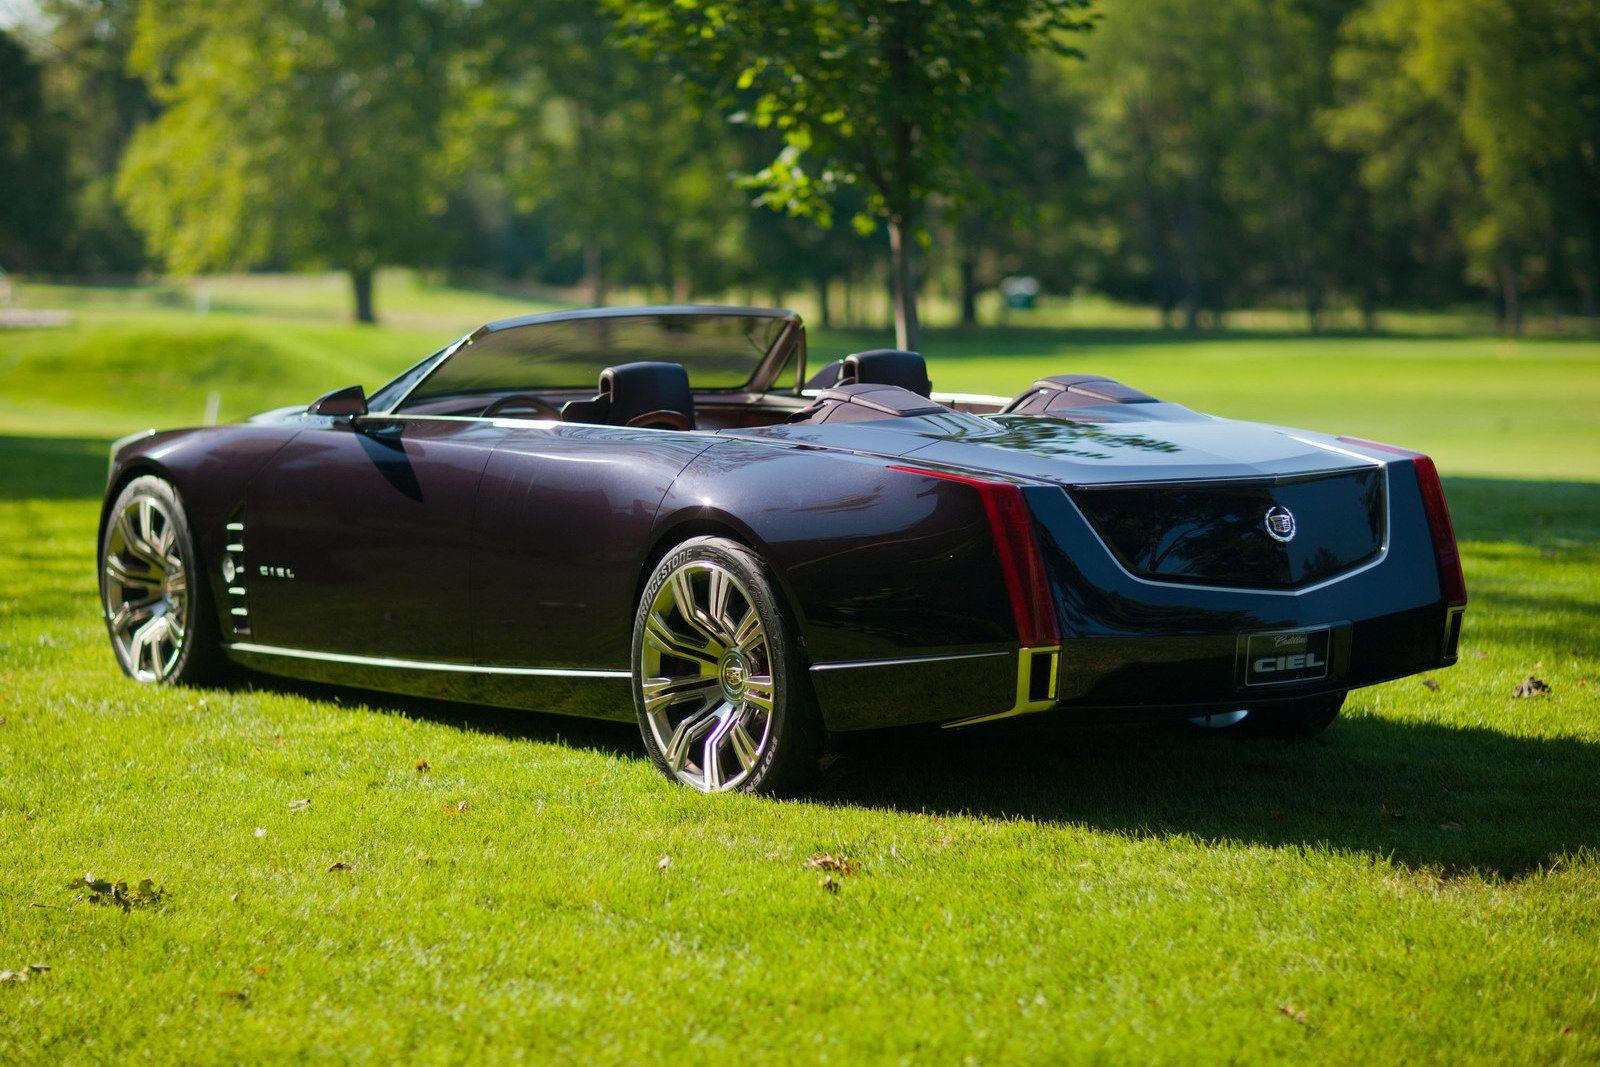 2015-cadillac-elmiraj-convertible-cadillac-ciel-concept-23jpg-picture.jpg (1600×1067)